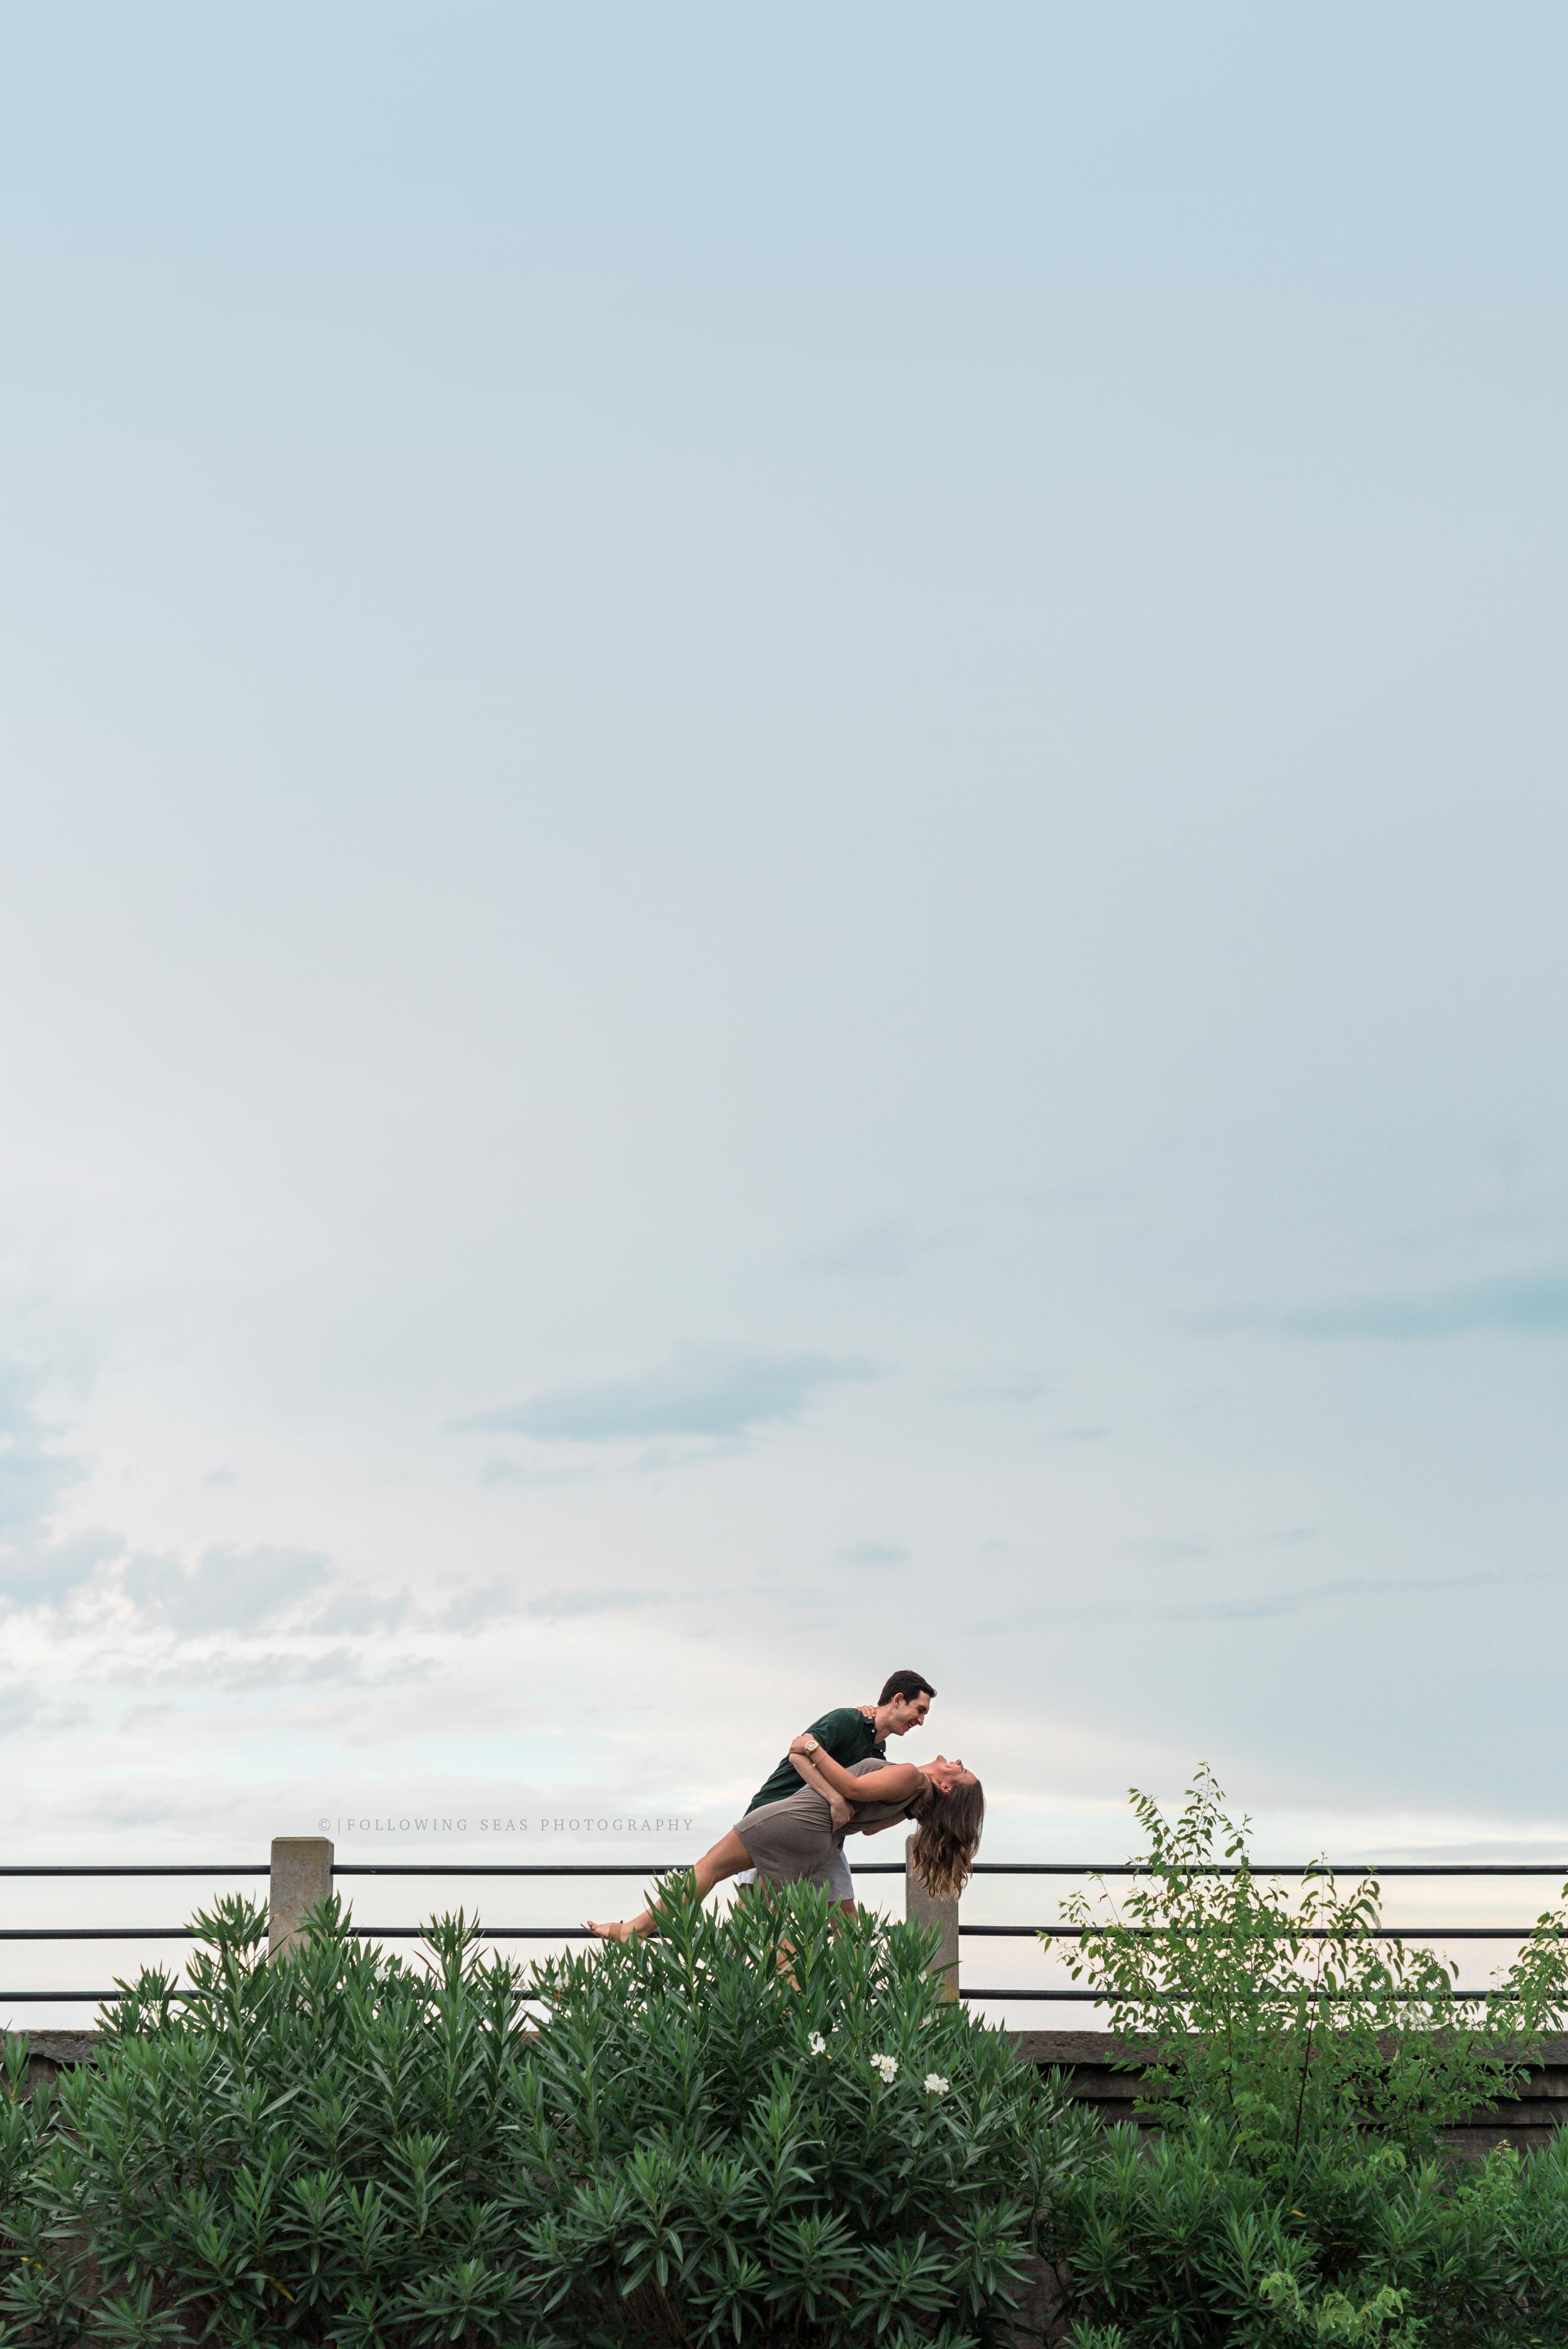 Charleston-Couples-Photographer-Following-Seas-Photography-2710 copy.jpg